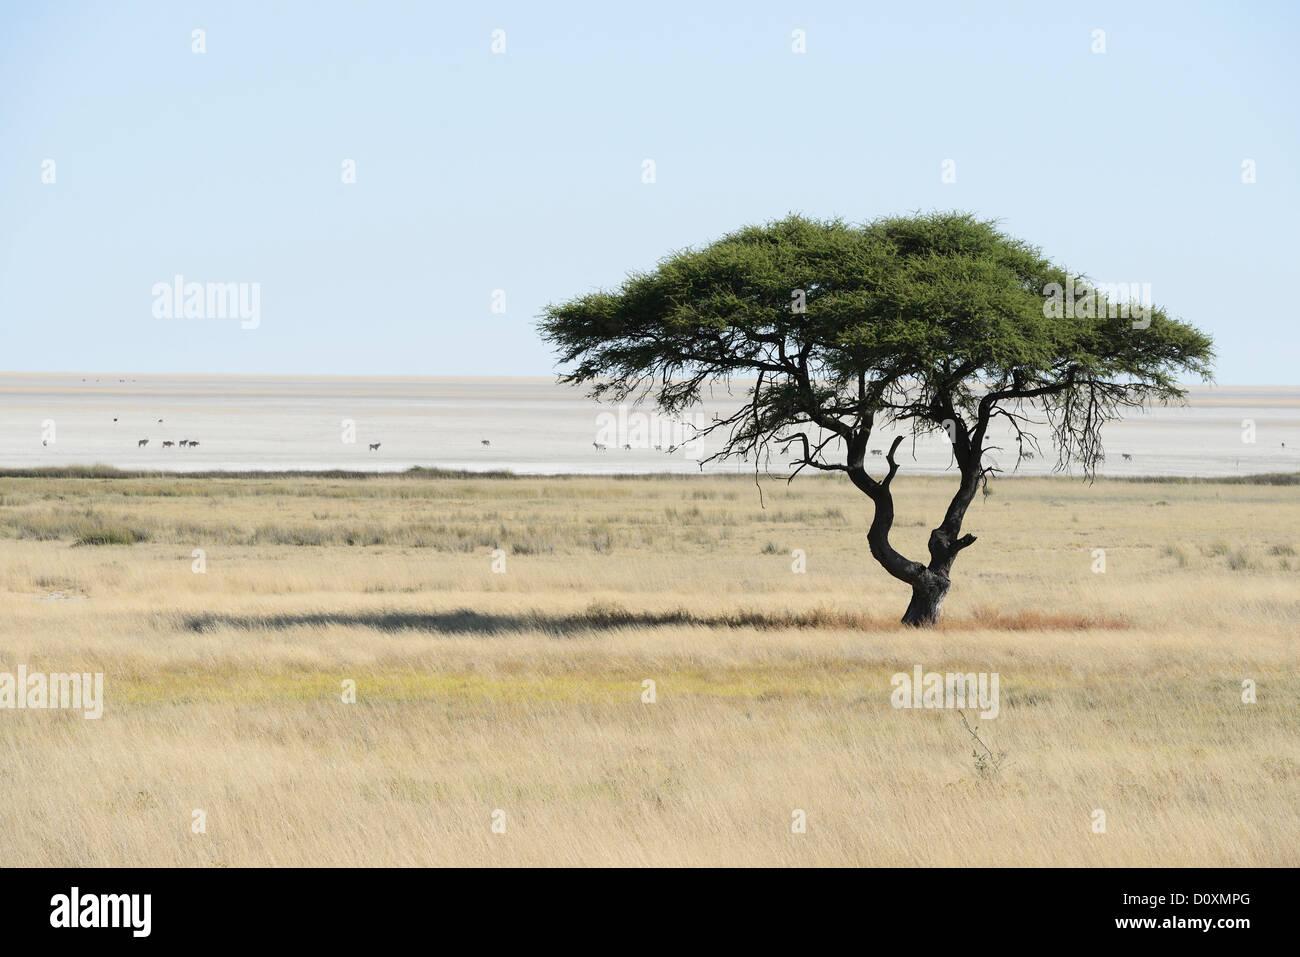 Africa, Etosha, National Park, Namibia, african, animal, bright, horizontal, plains, safari, savannah, tree - Stock Image